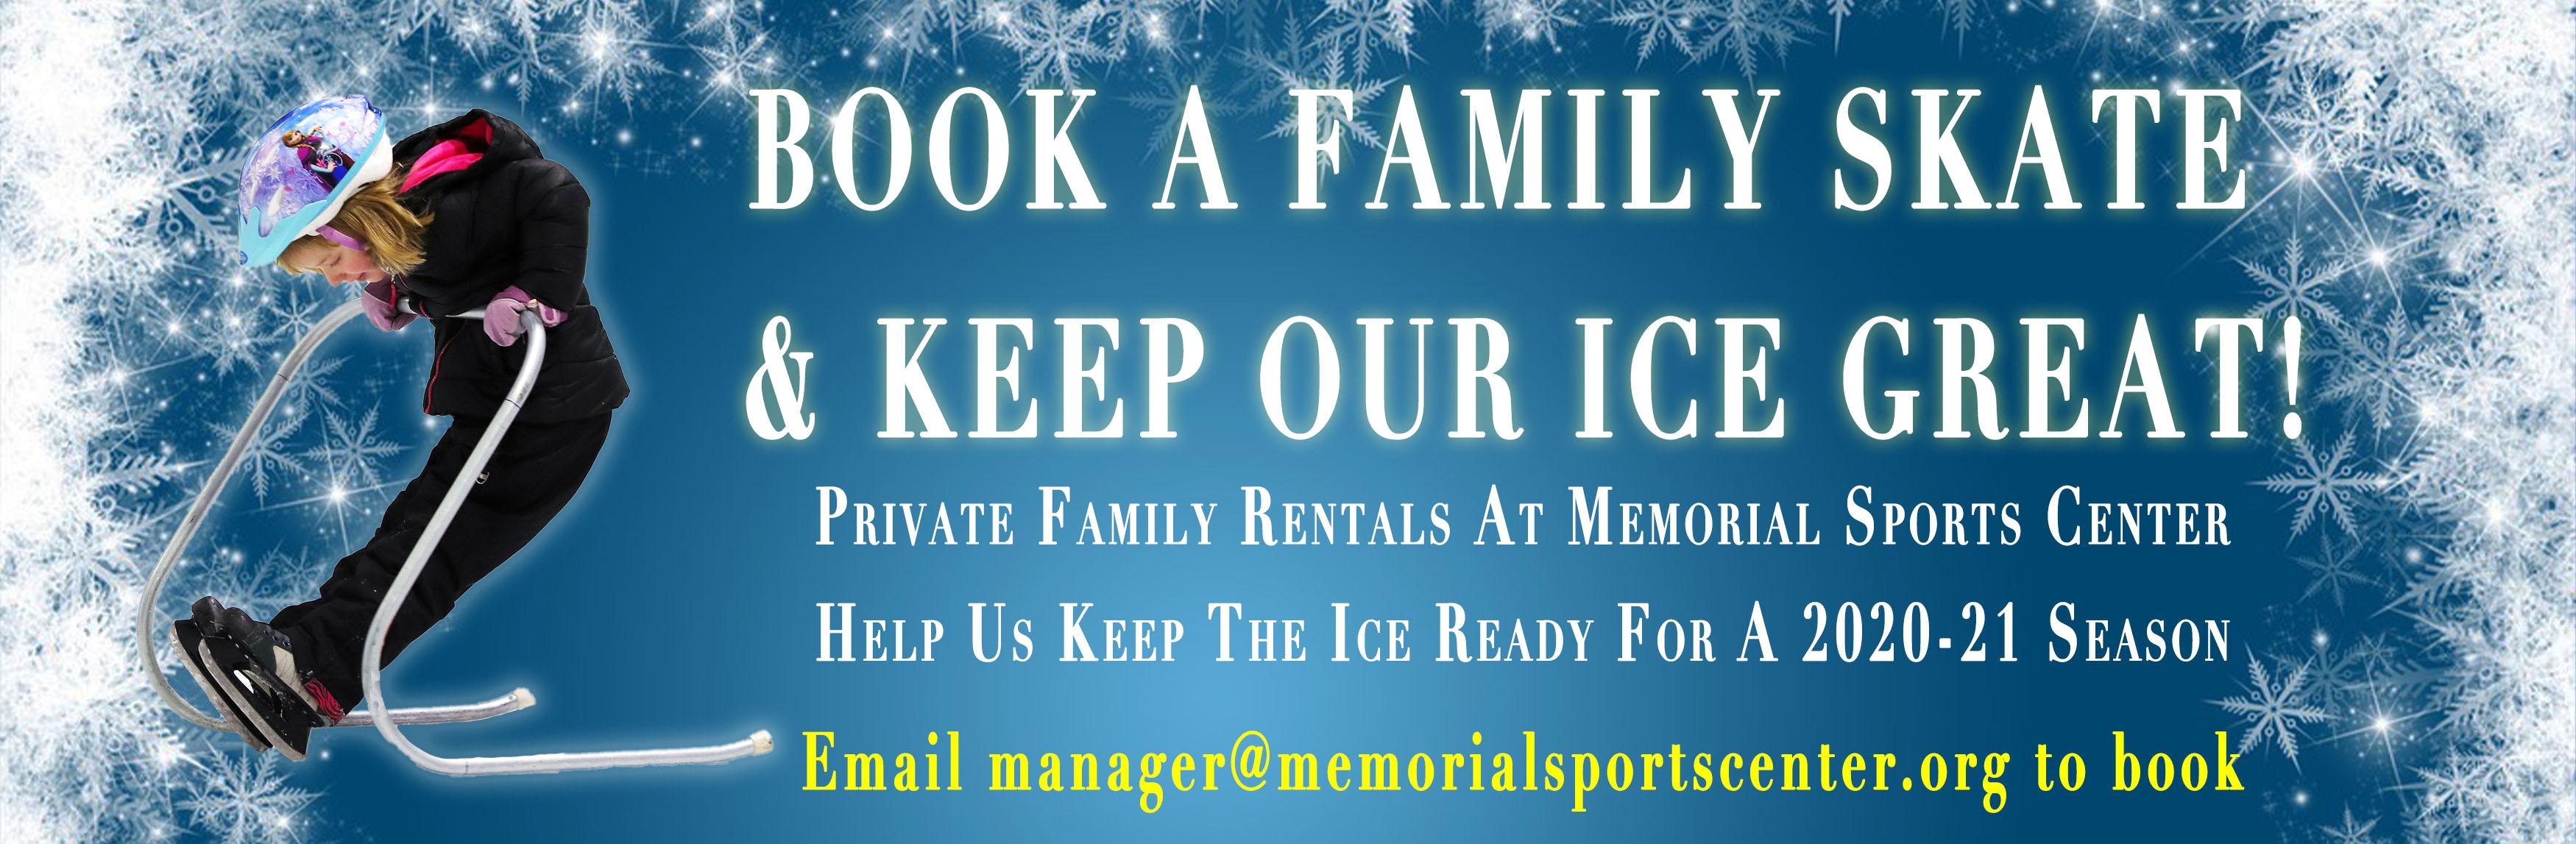 Memorial Sports Center